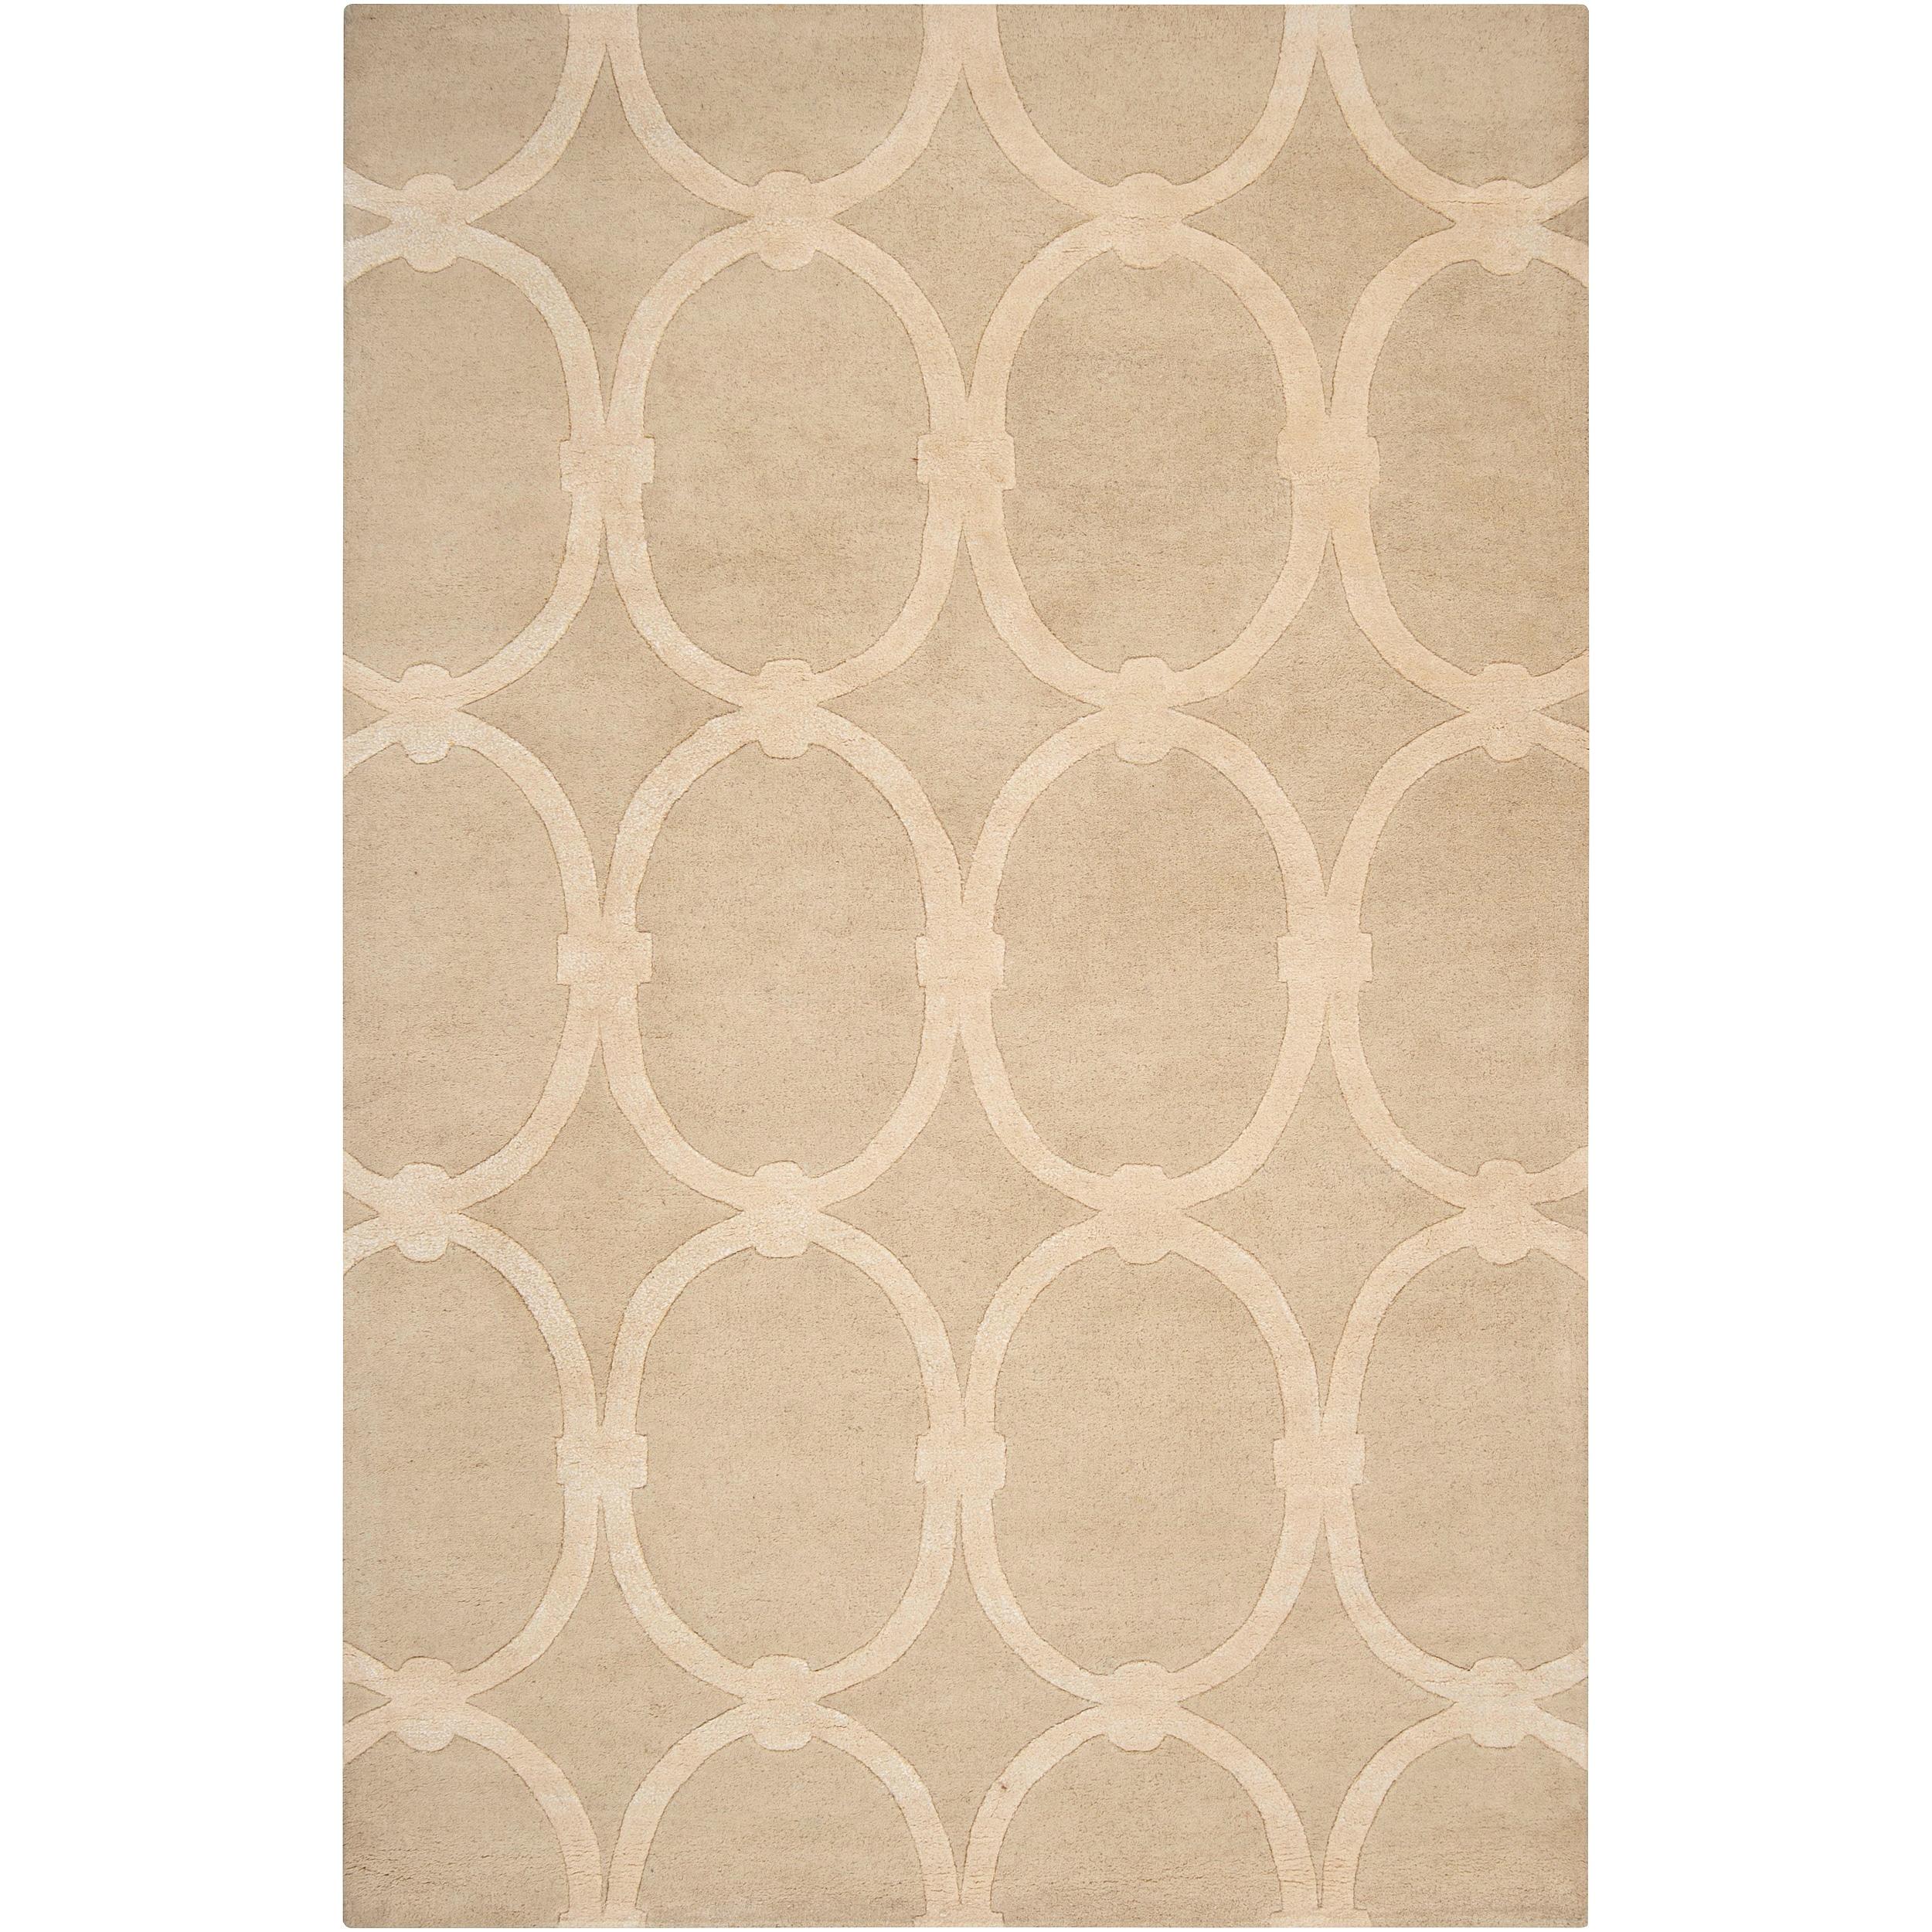 Hand-tufted Tan Acropolis Trellis Pattern Wool Rug (8' x 11')